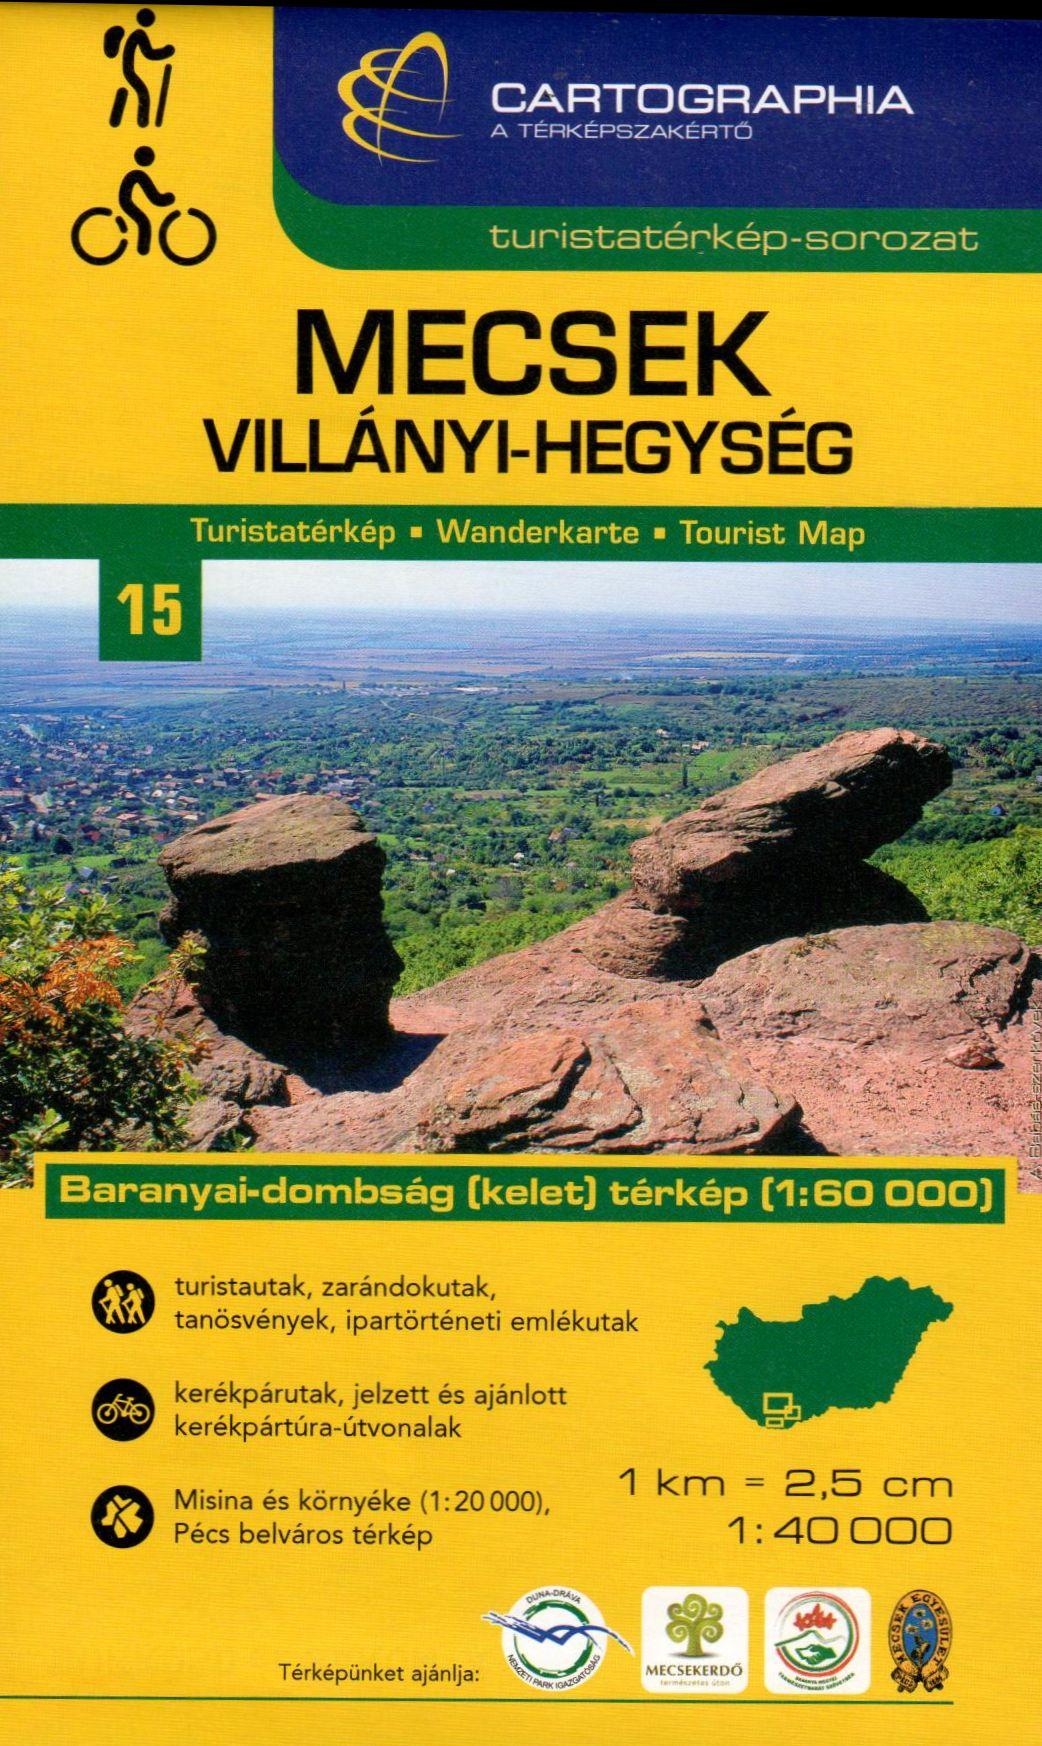 Inset maps: Misina-Tubes 1:20.000, Baranya hills (East)1:60.000